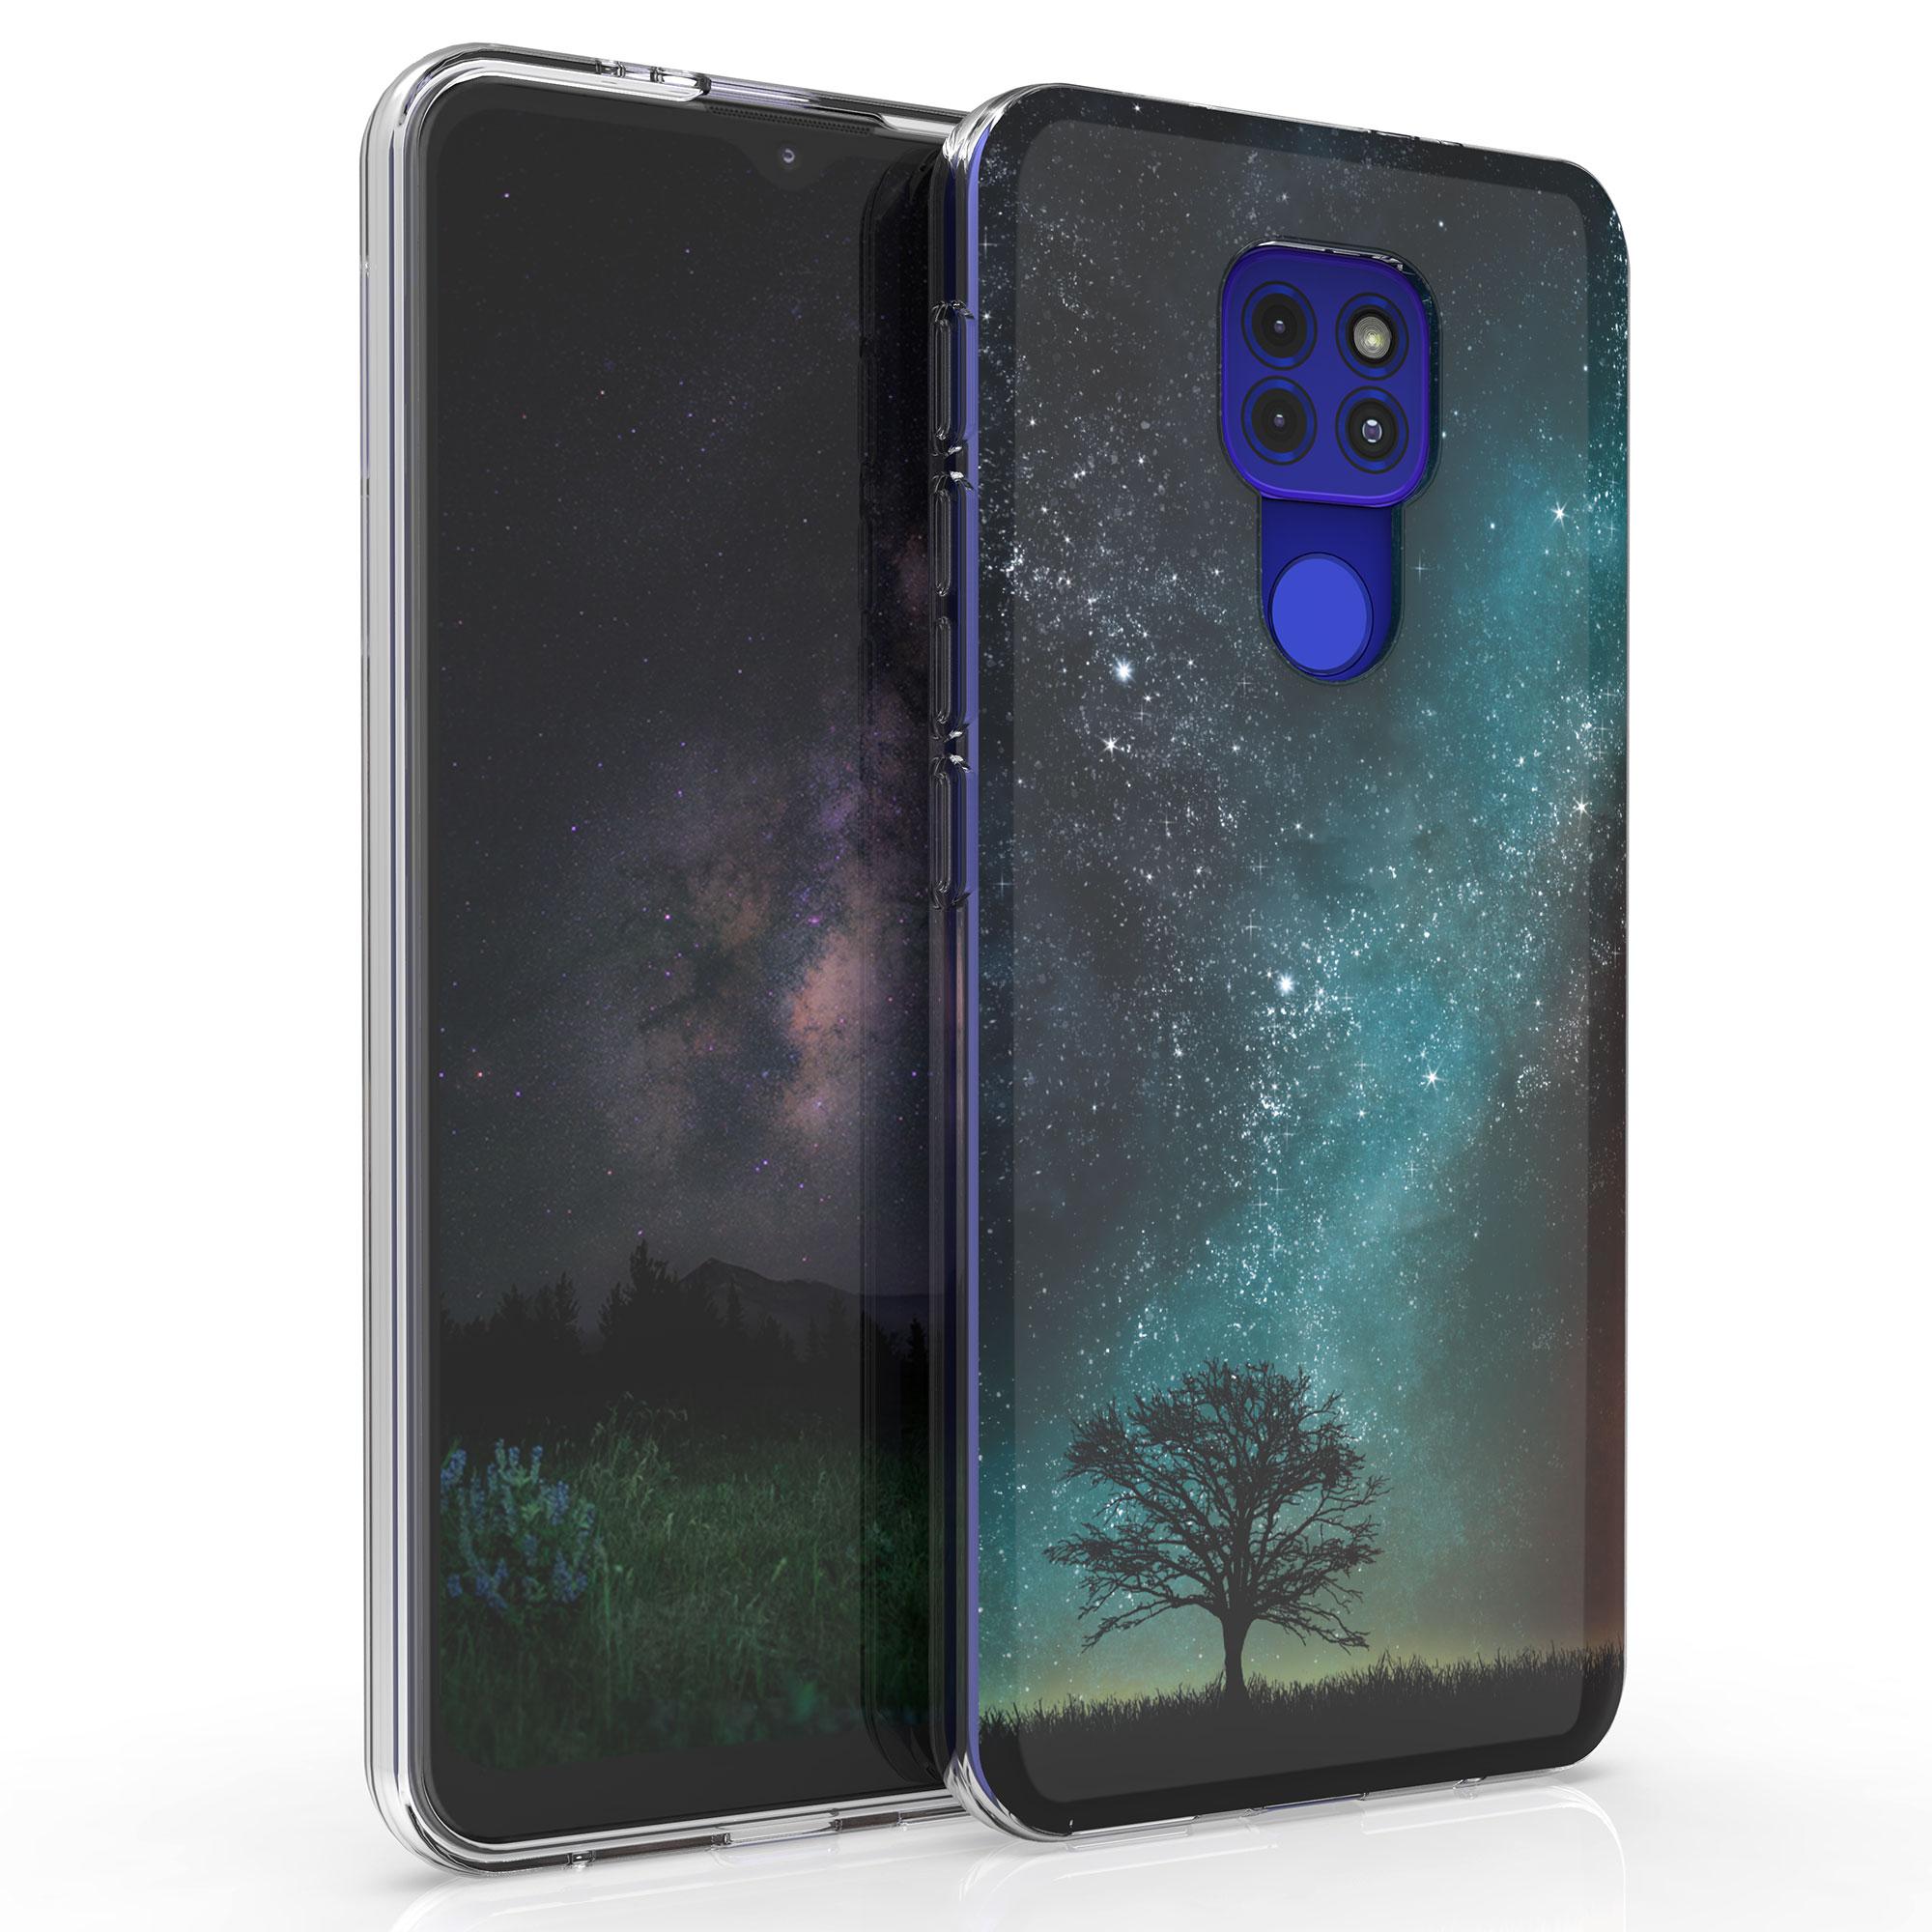 Kvalitní silikonové TPU pouzdro   obal pro Motorola Moto G9 Play / Moto E7 Plus -  Cosmic Nature Blue / Grey / Black